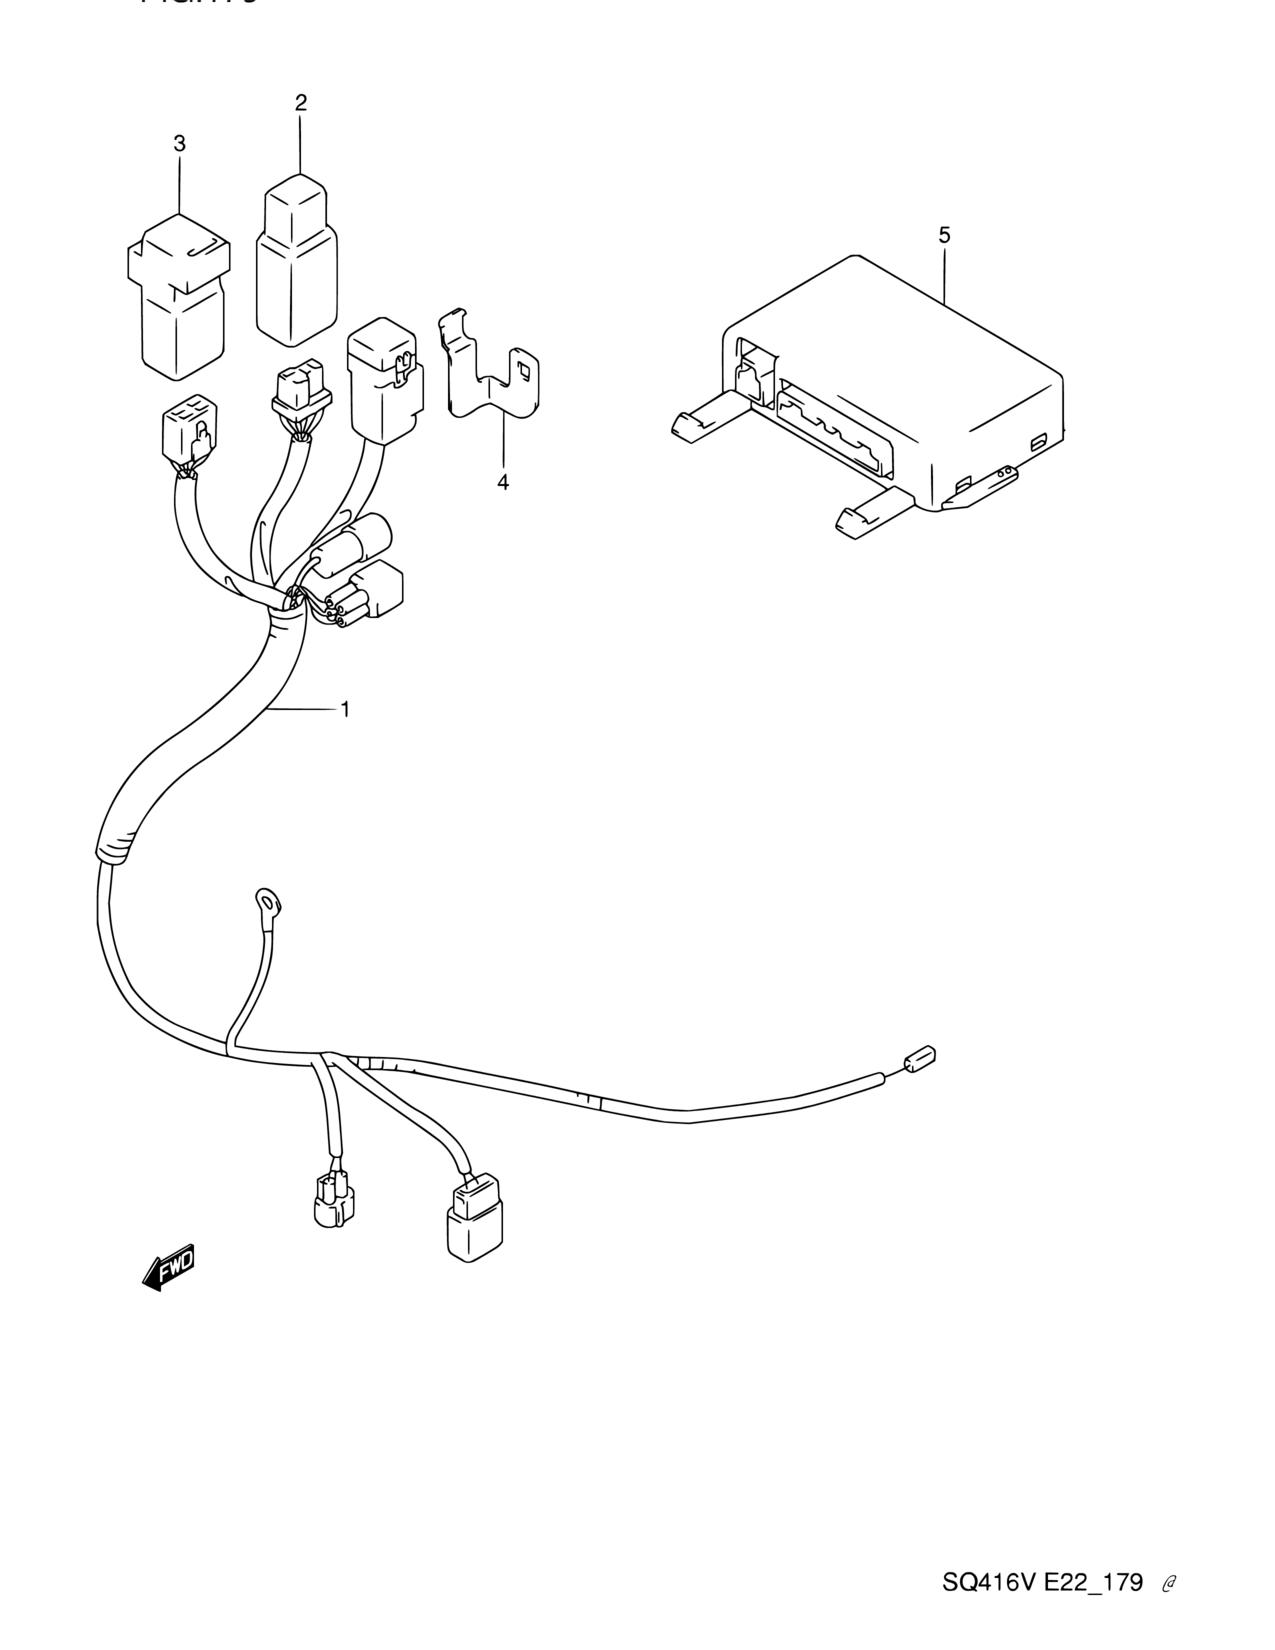 2005 Suzuki Forenza Wiring Diagram Images